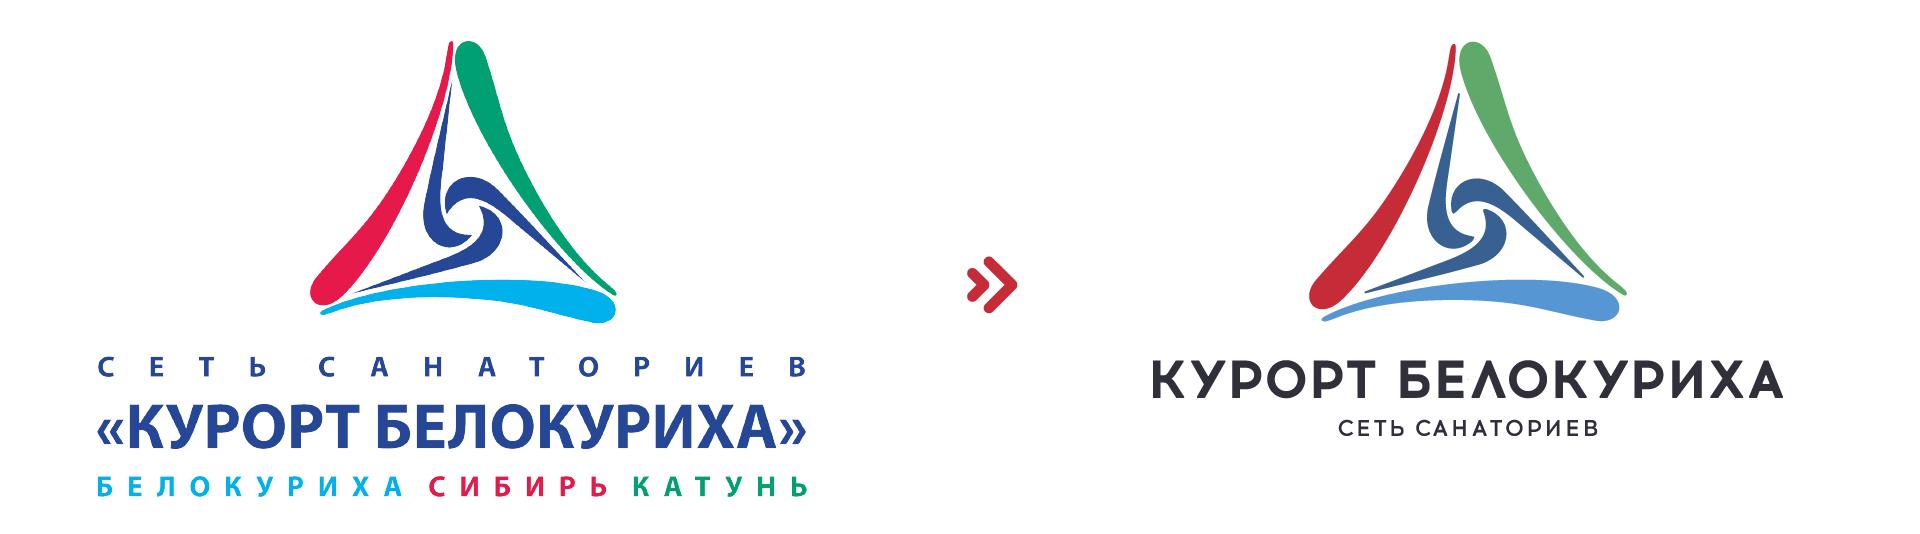 Белокуриха - HMS Brands - кейсы, брендинг - лого